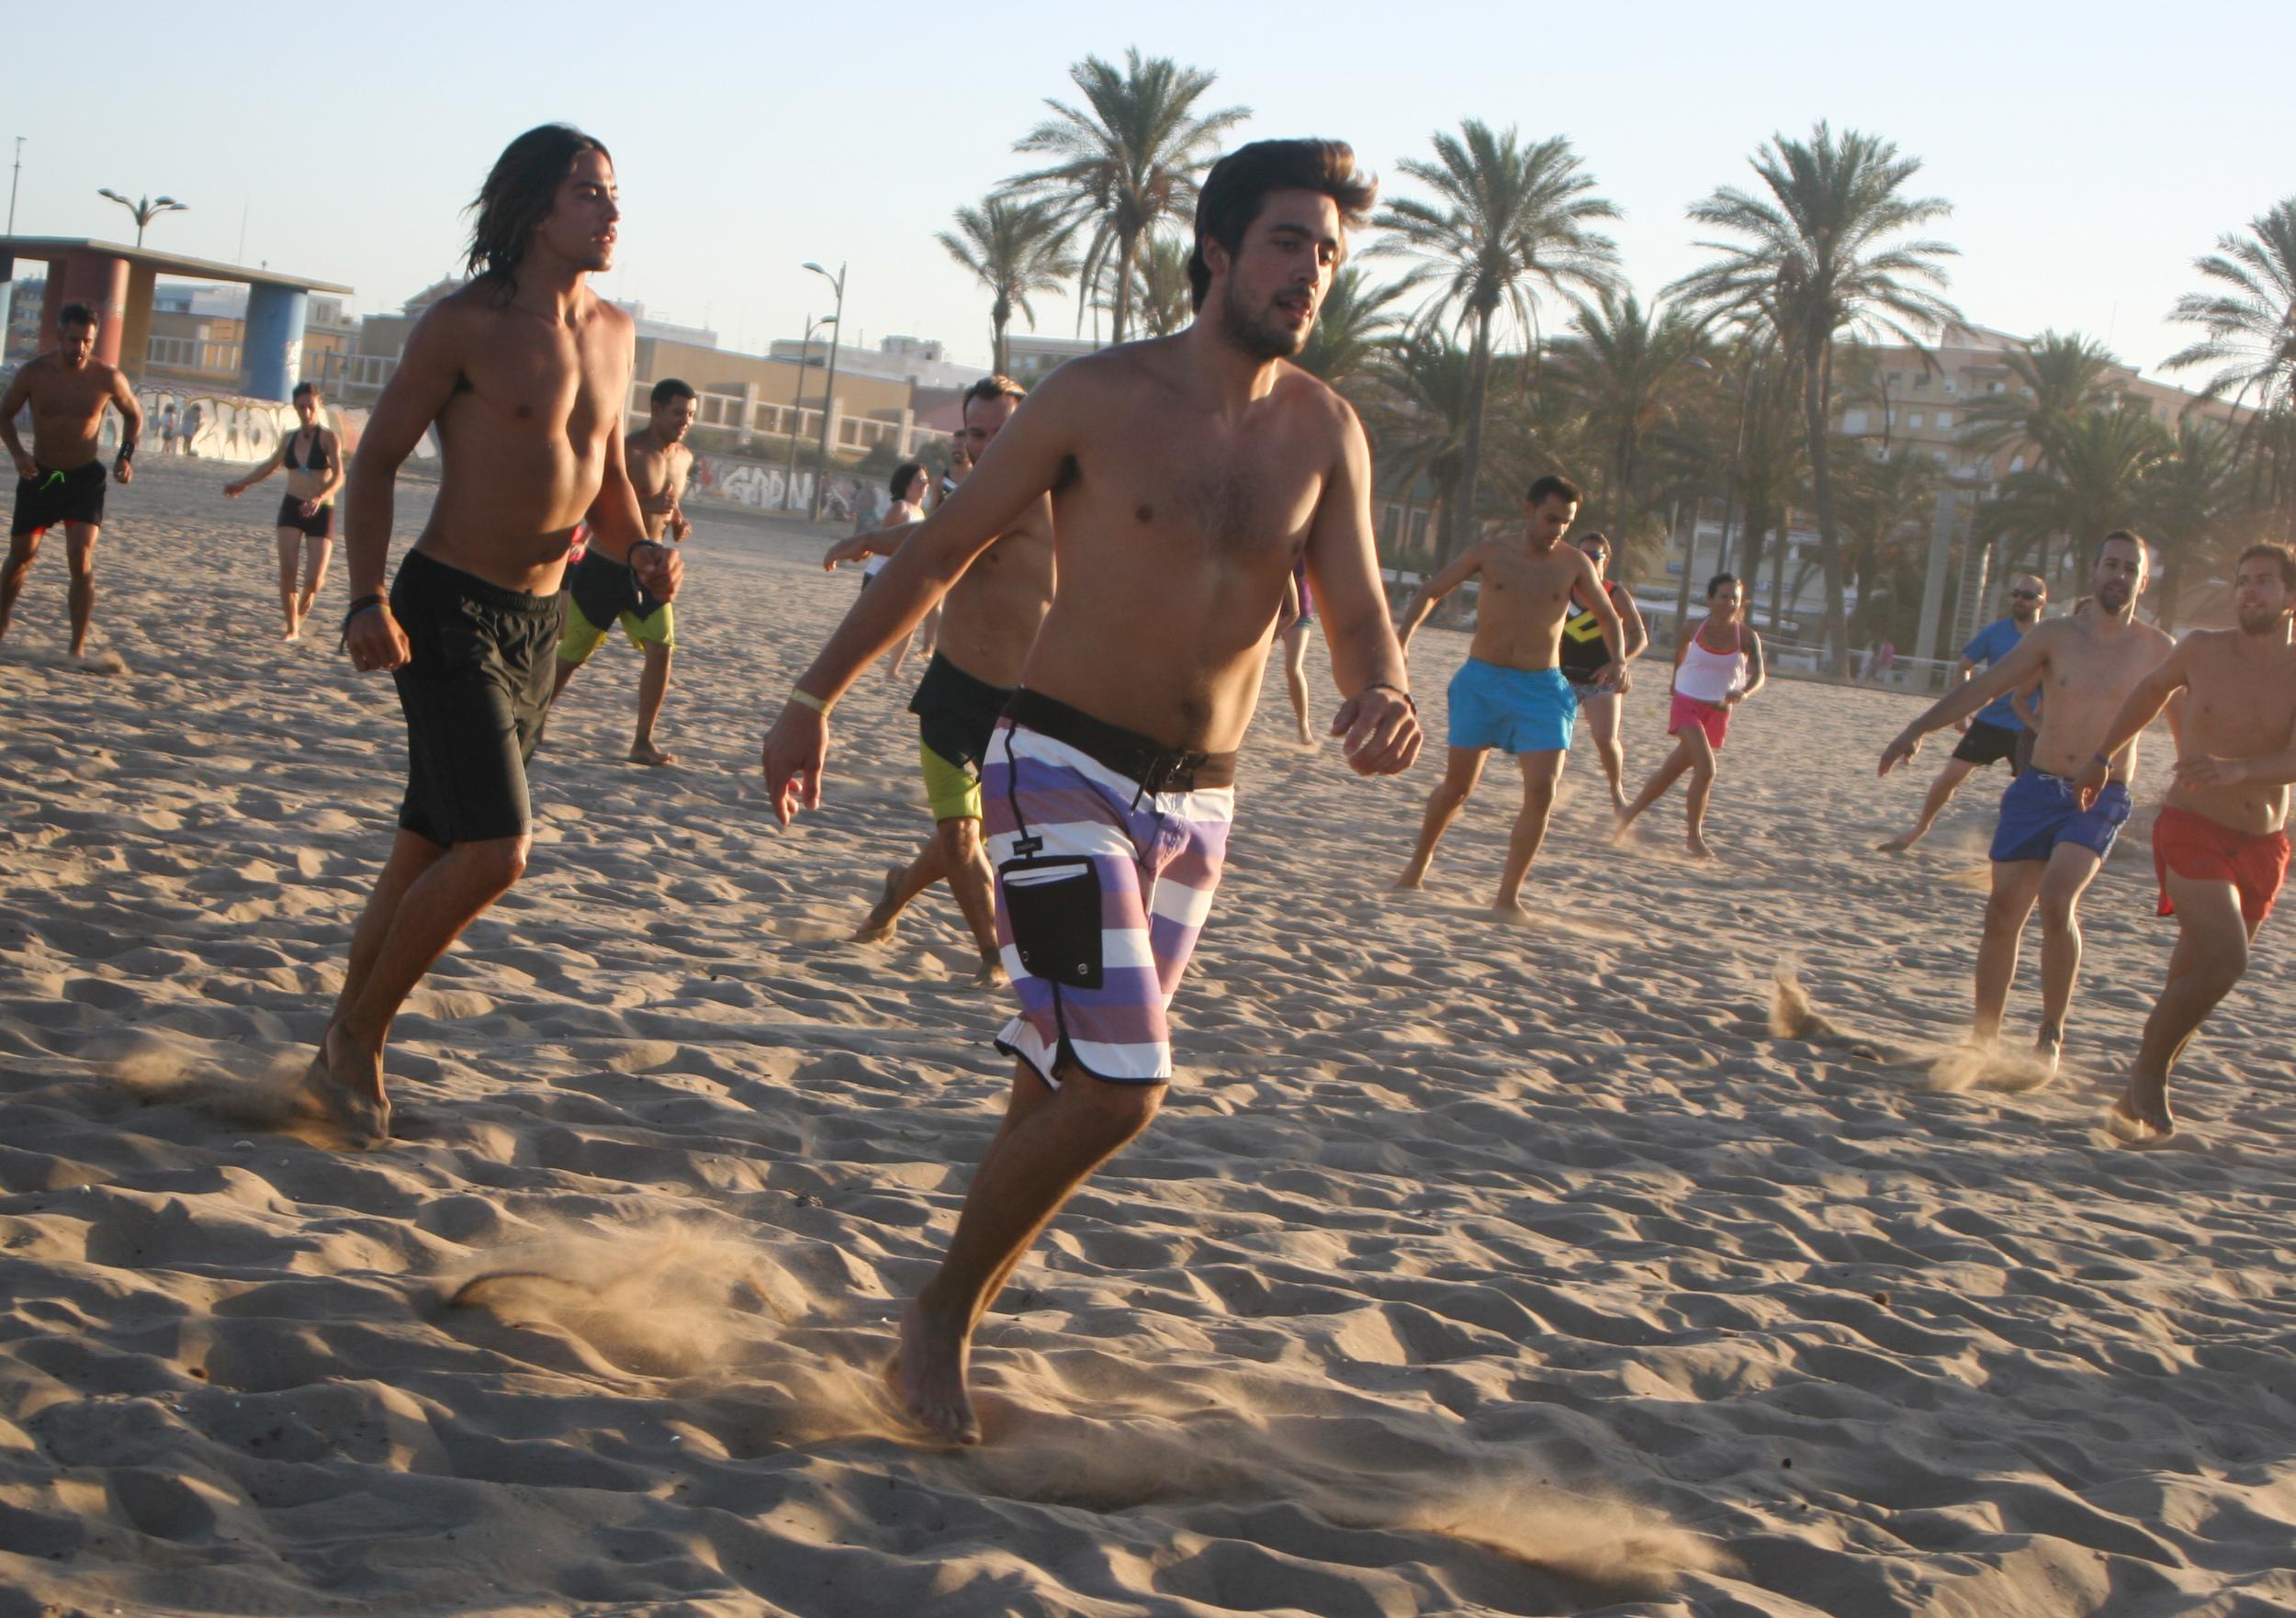 Full_CrossFit_Beach_Wod_V2_2015-11.jpg